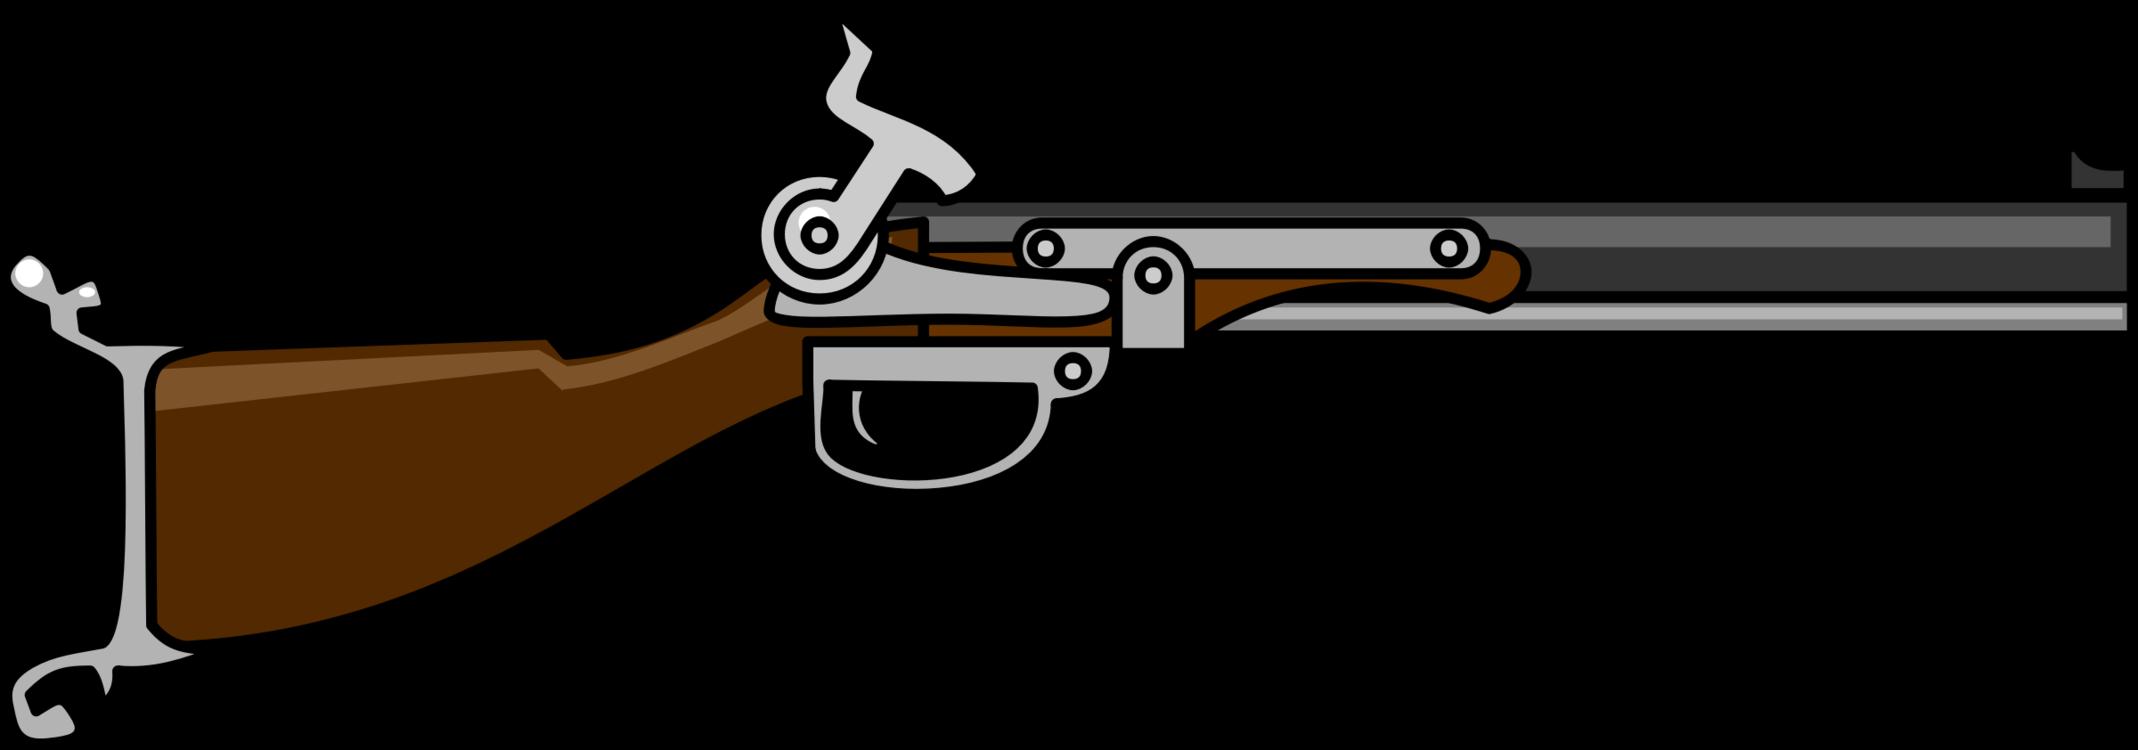 Gun Barrel,Shotgun,Ranged Weapon Vector Clipart.